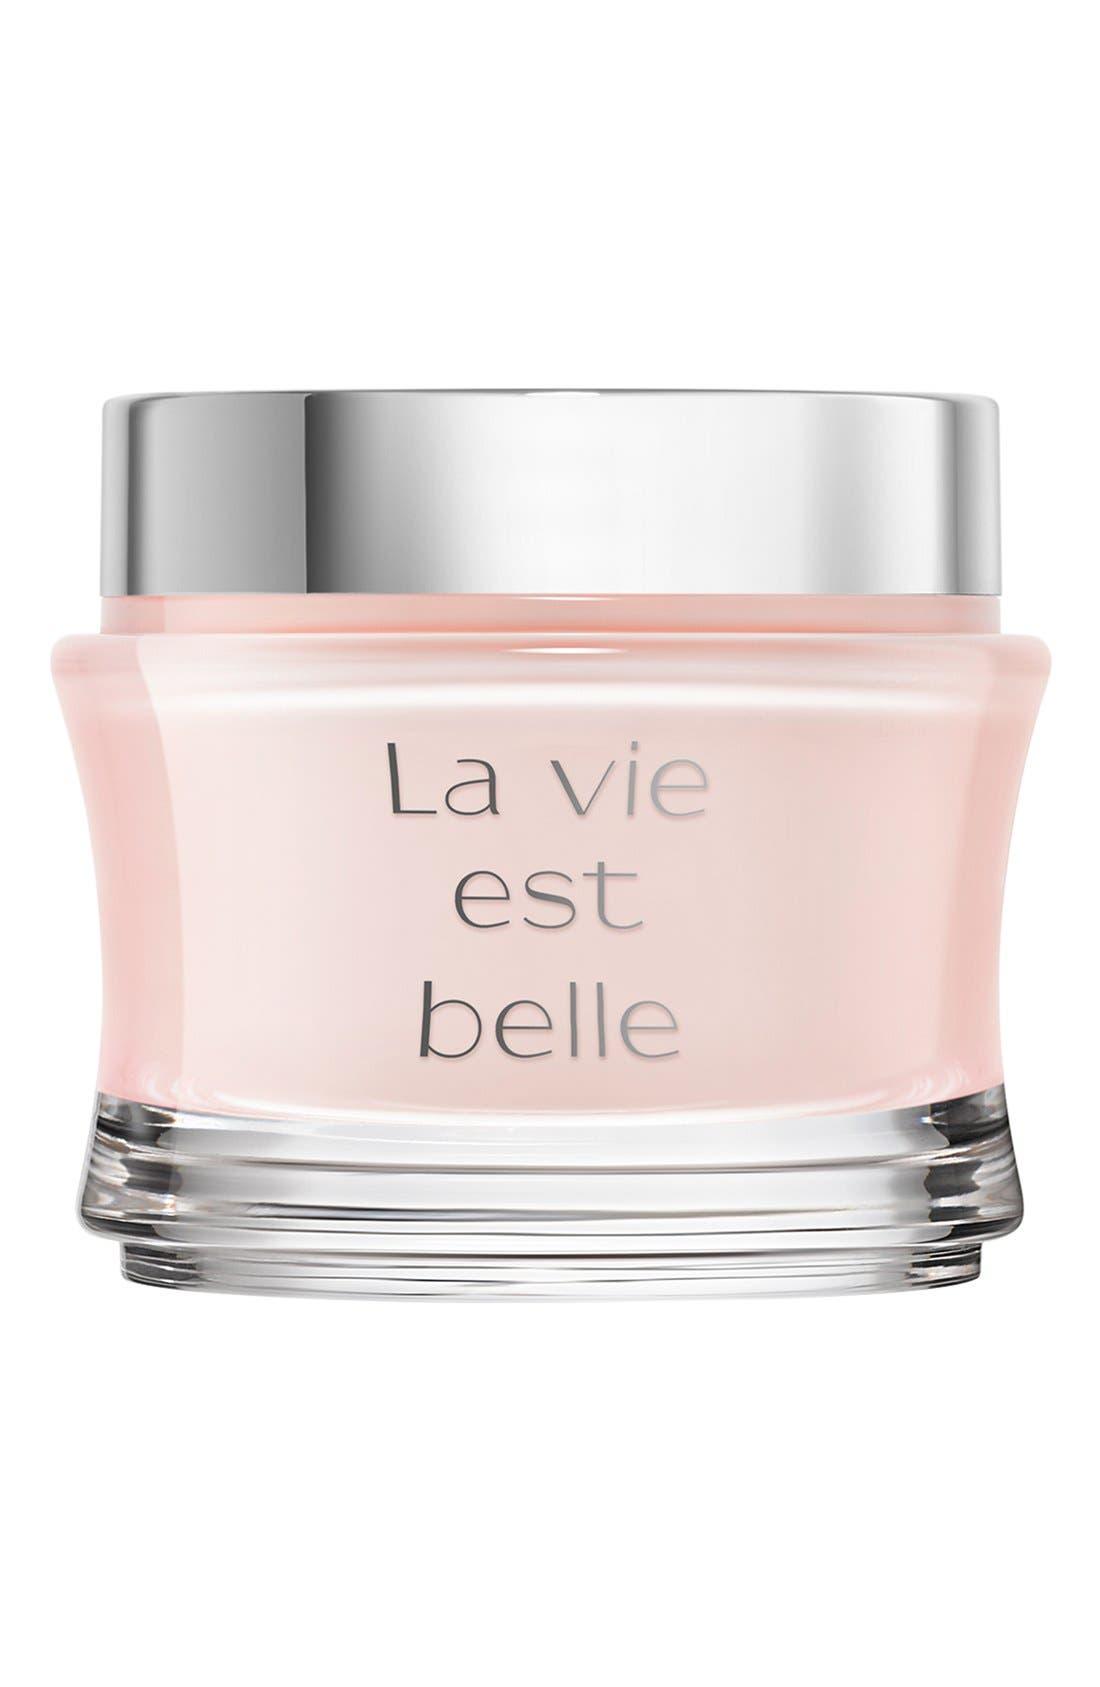 La Vie estBelle Body Cream,                             Main thumbnail 1, color,                             NO COLOR